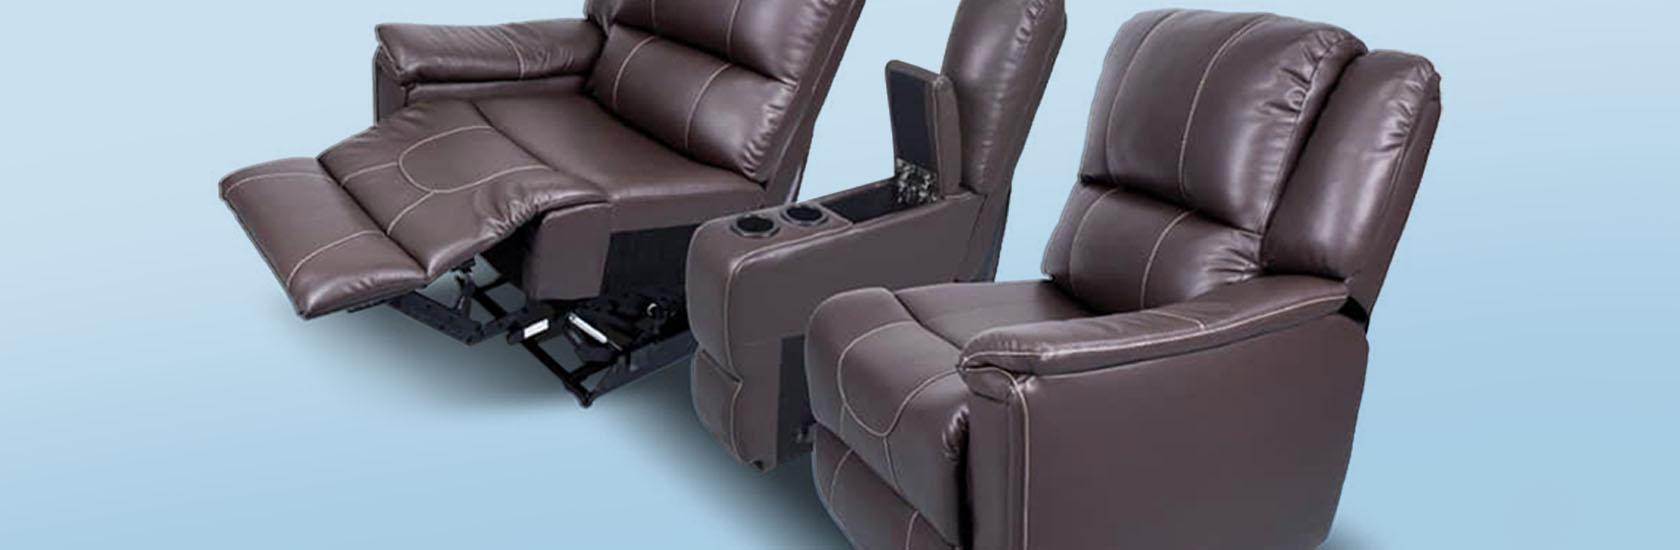 Special Savings on RV Furniture & Mattresses